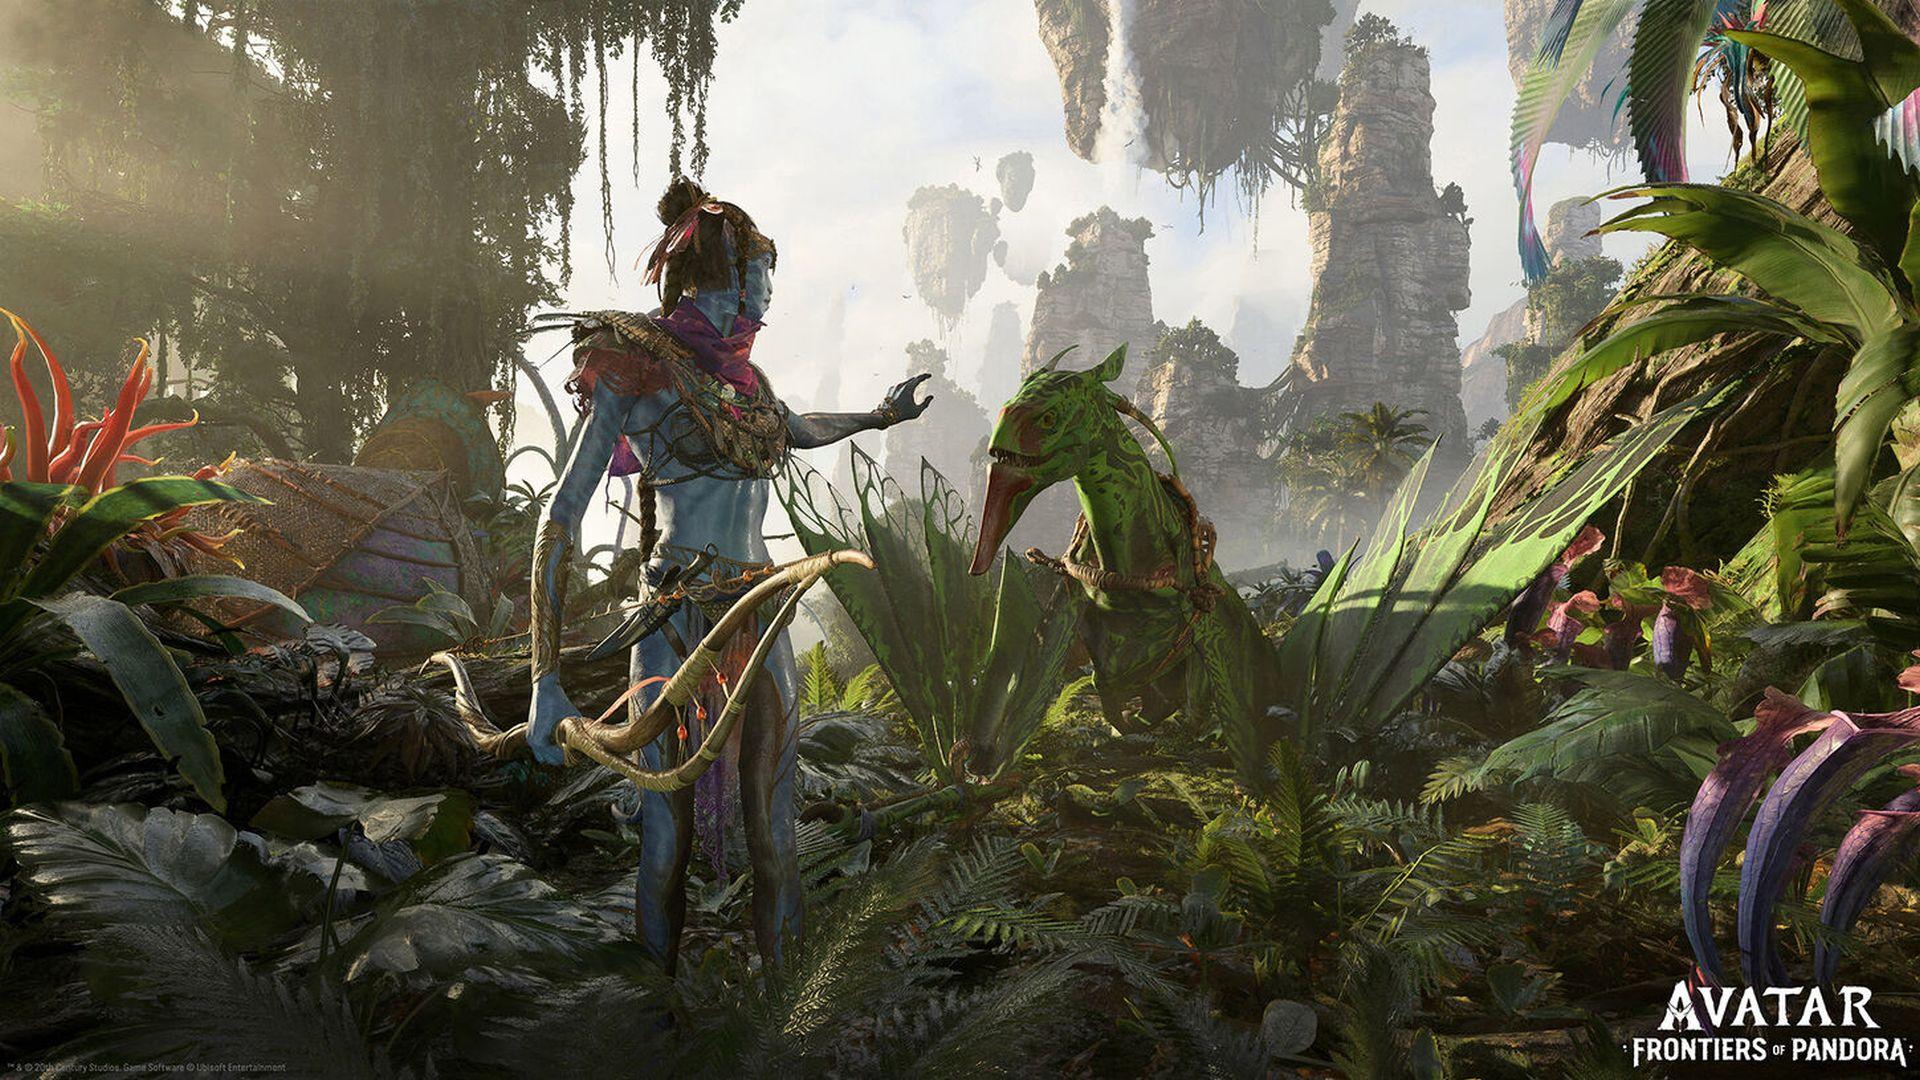 Avatar-Frontiers-of-Pandora-thumb.jpg